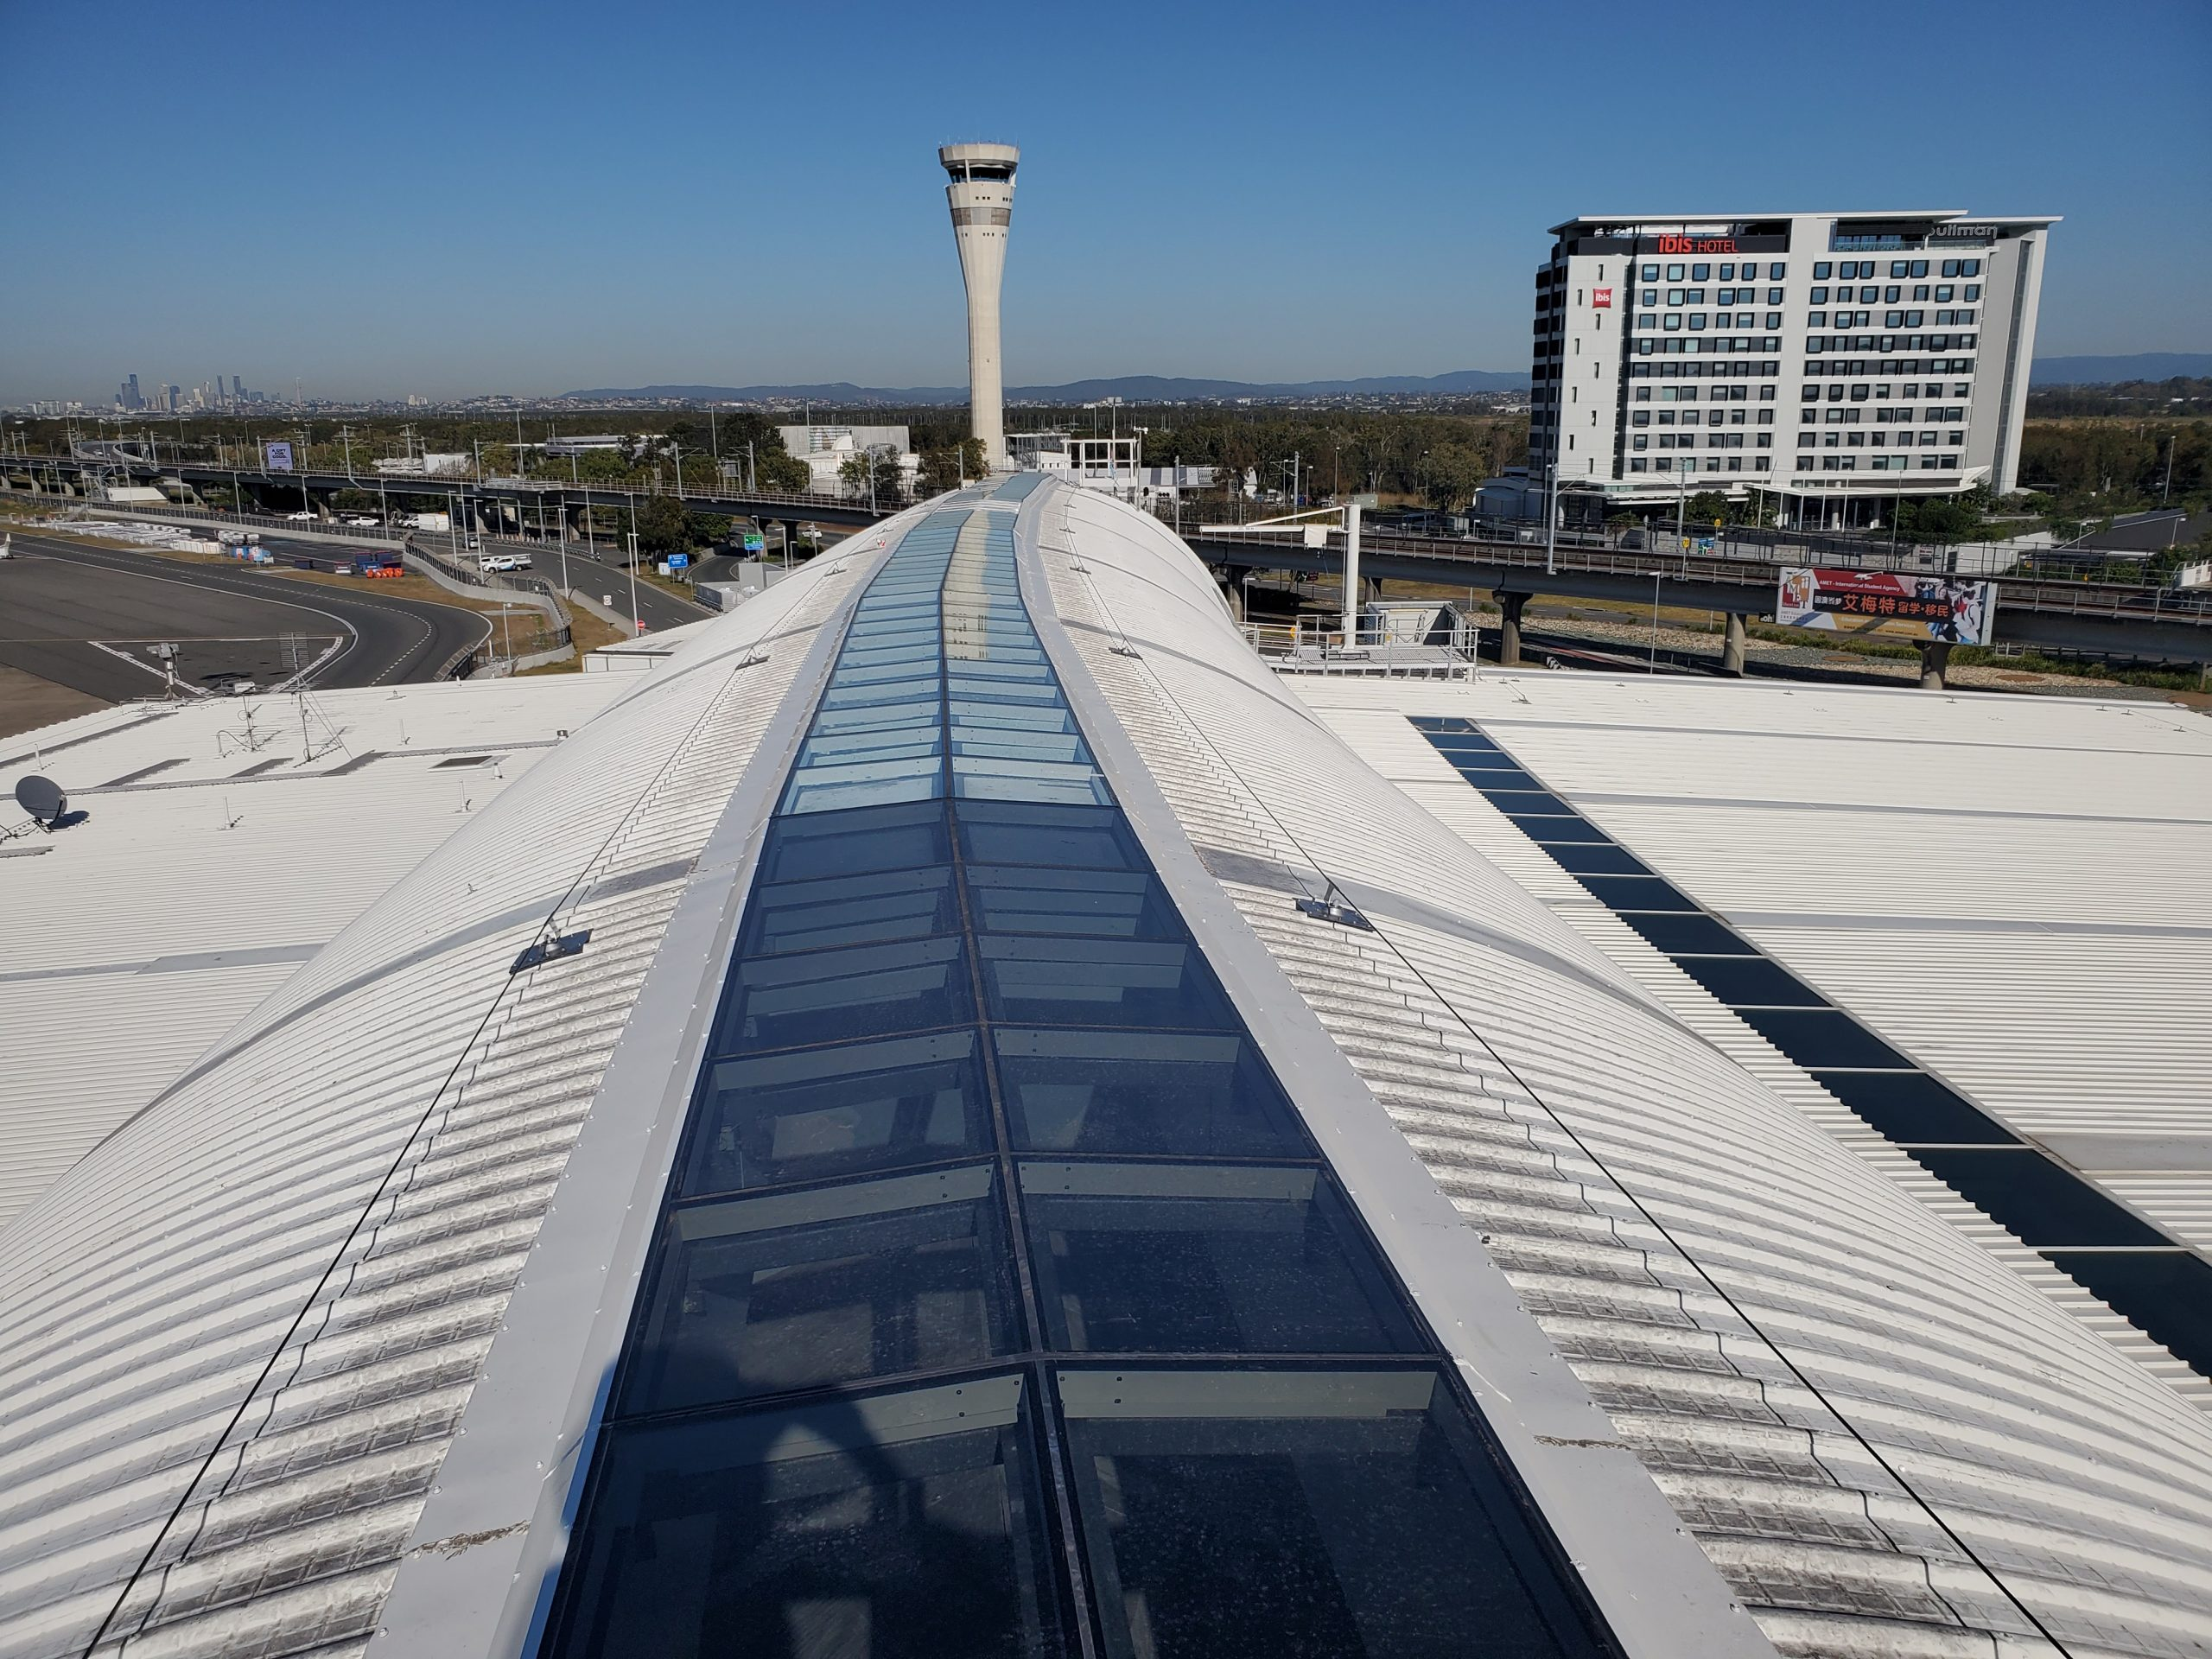 brisbane airport roof